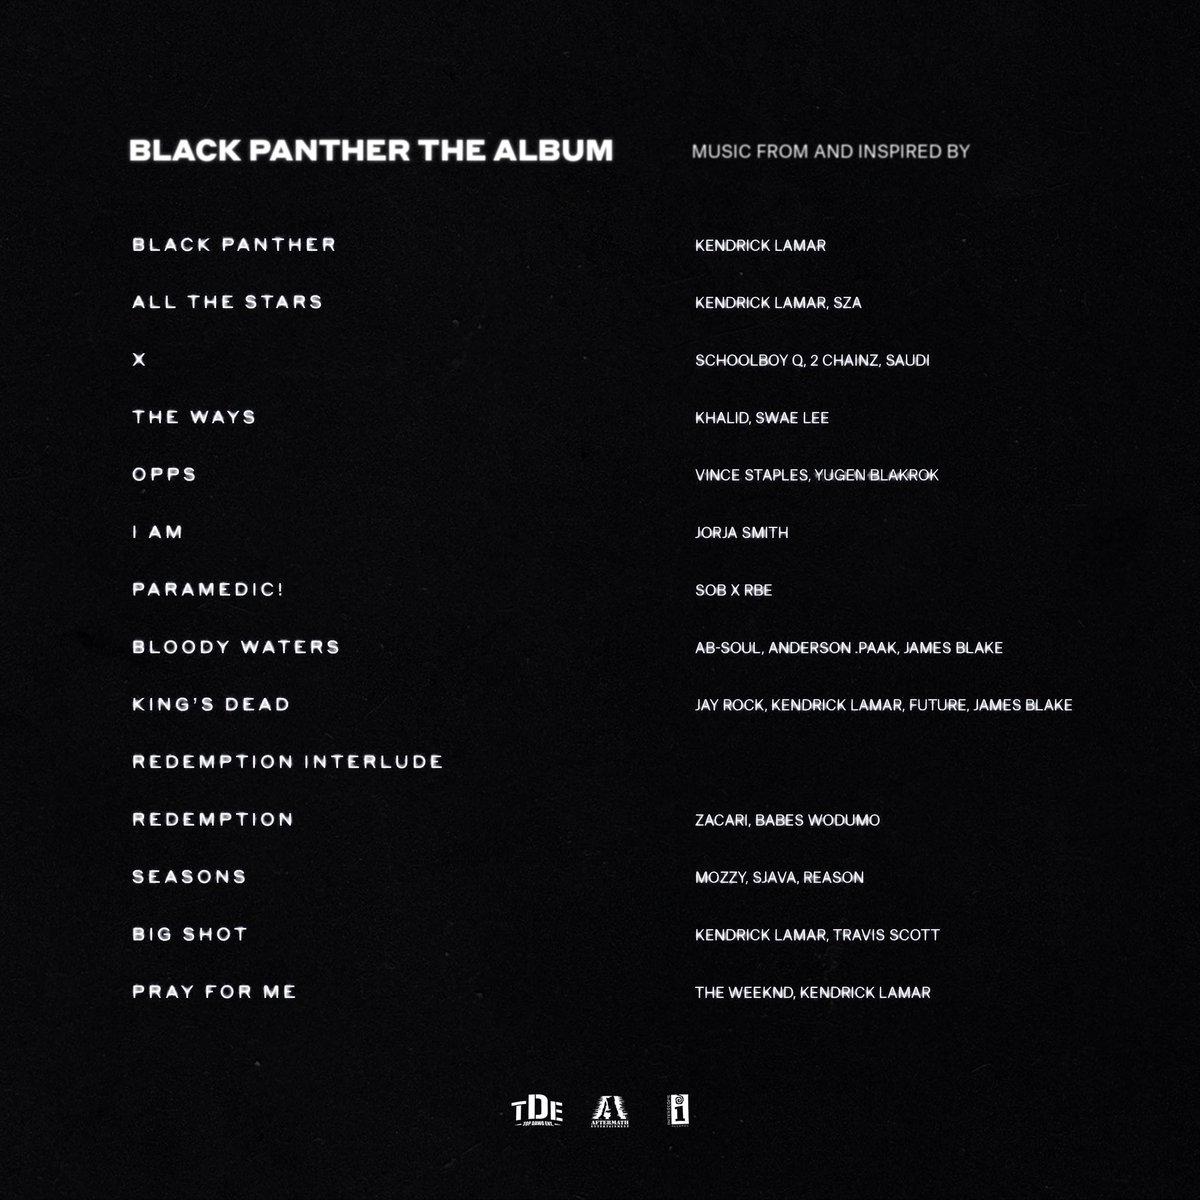 Divulgado a capa do álbum e a lista de faixas da trilha sonora de Pantera Negra!